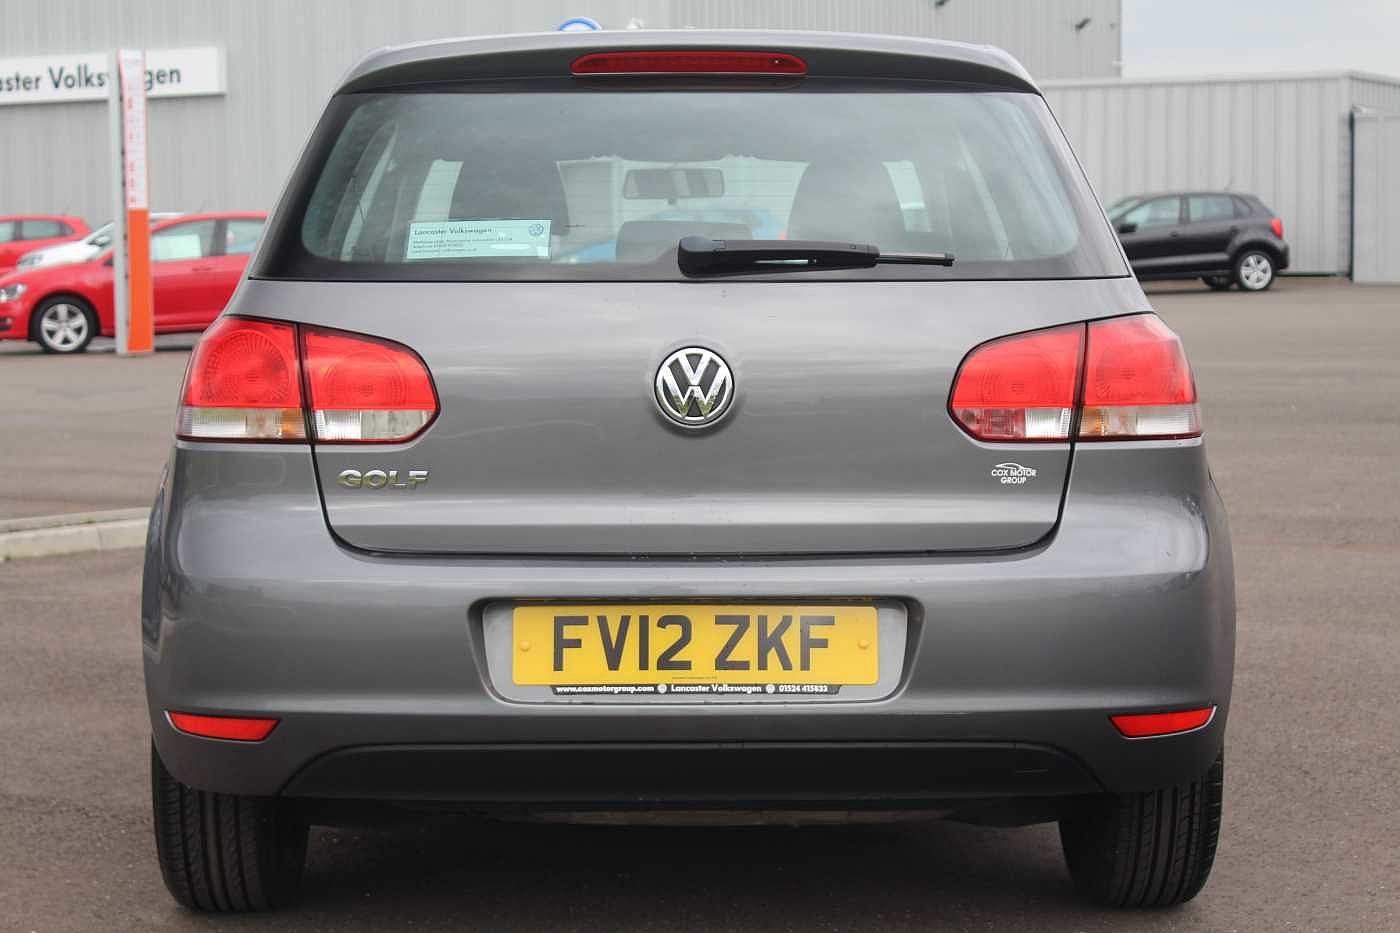 Volkswagen Golf Hatchback 1.4 S 5dr